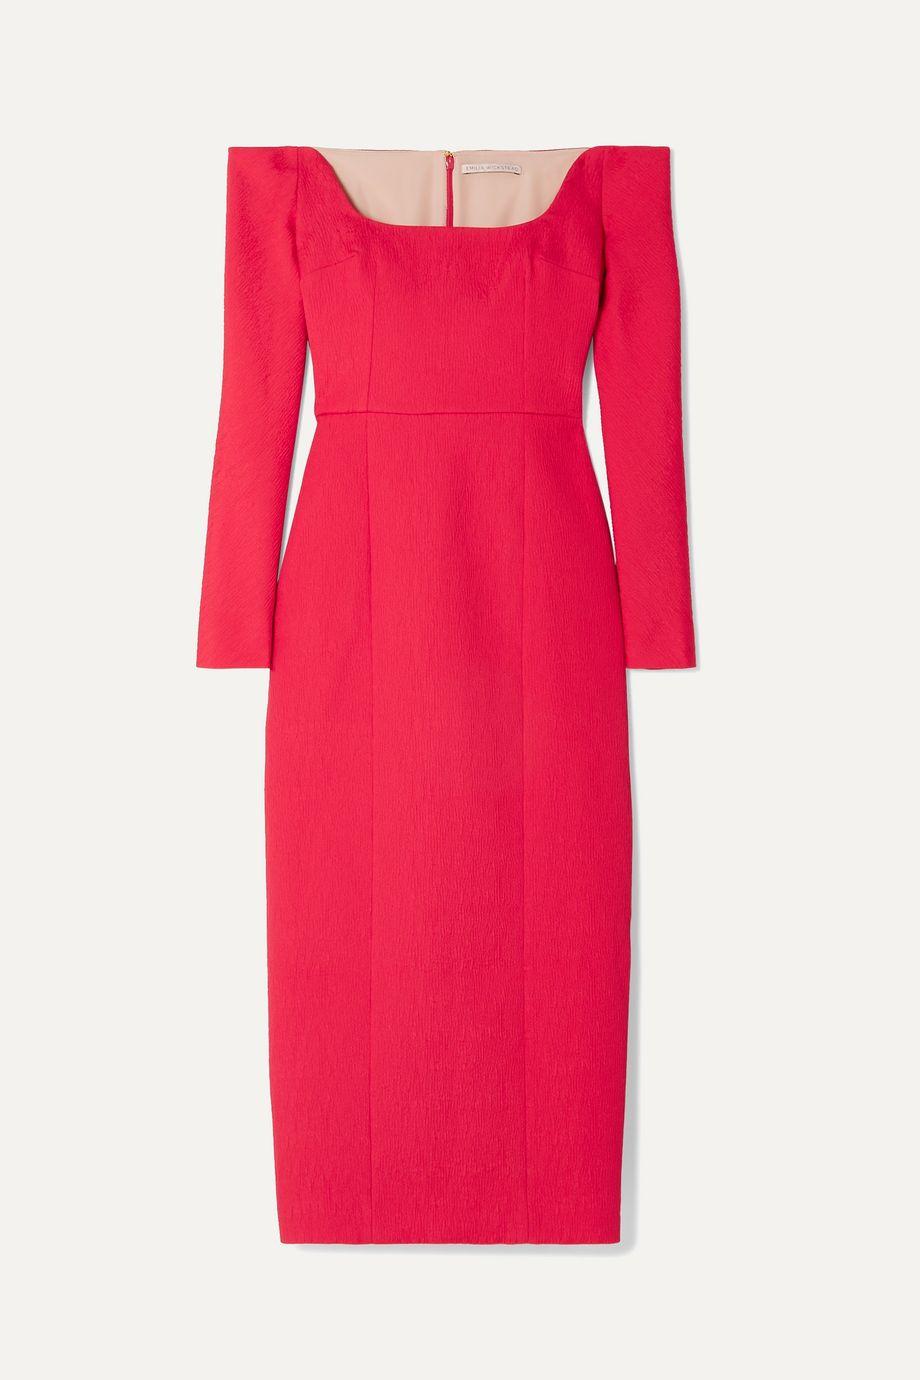 Emilia Wickstead Birch off-the-shoulder cloqué midi dress